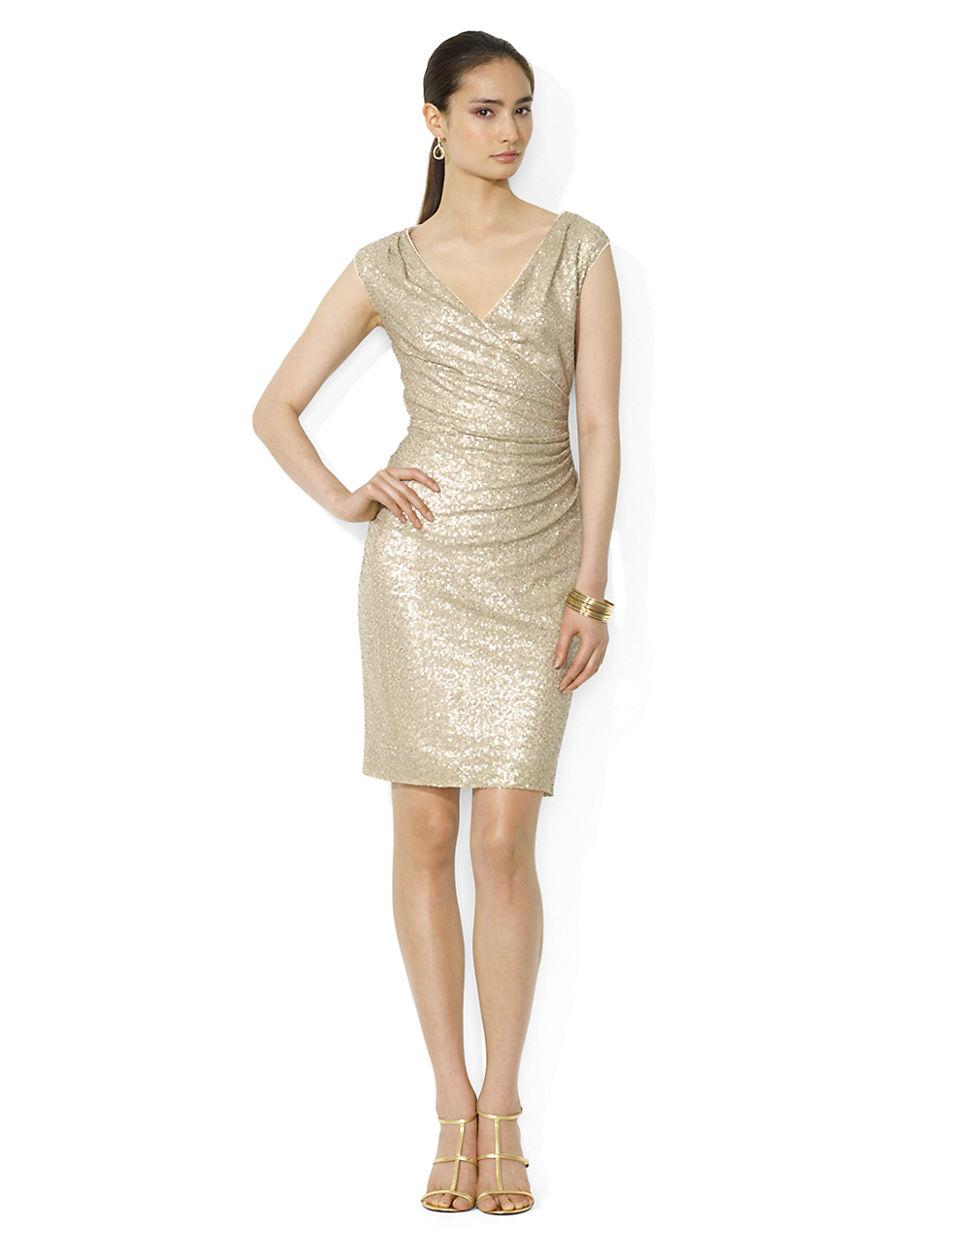 8a986ba2 Lyst - Lauren By Ralph Lauren Capsleeved Sequined Dress in Natural